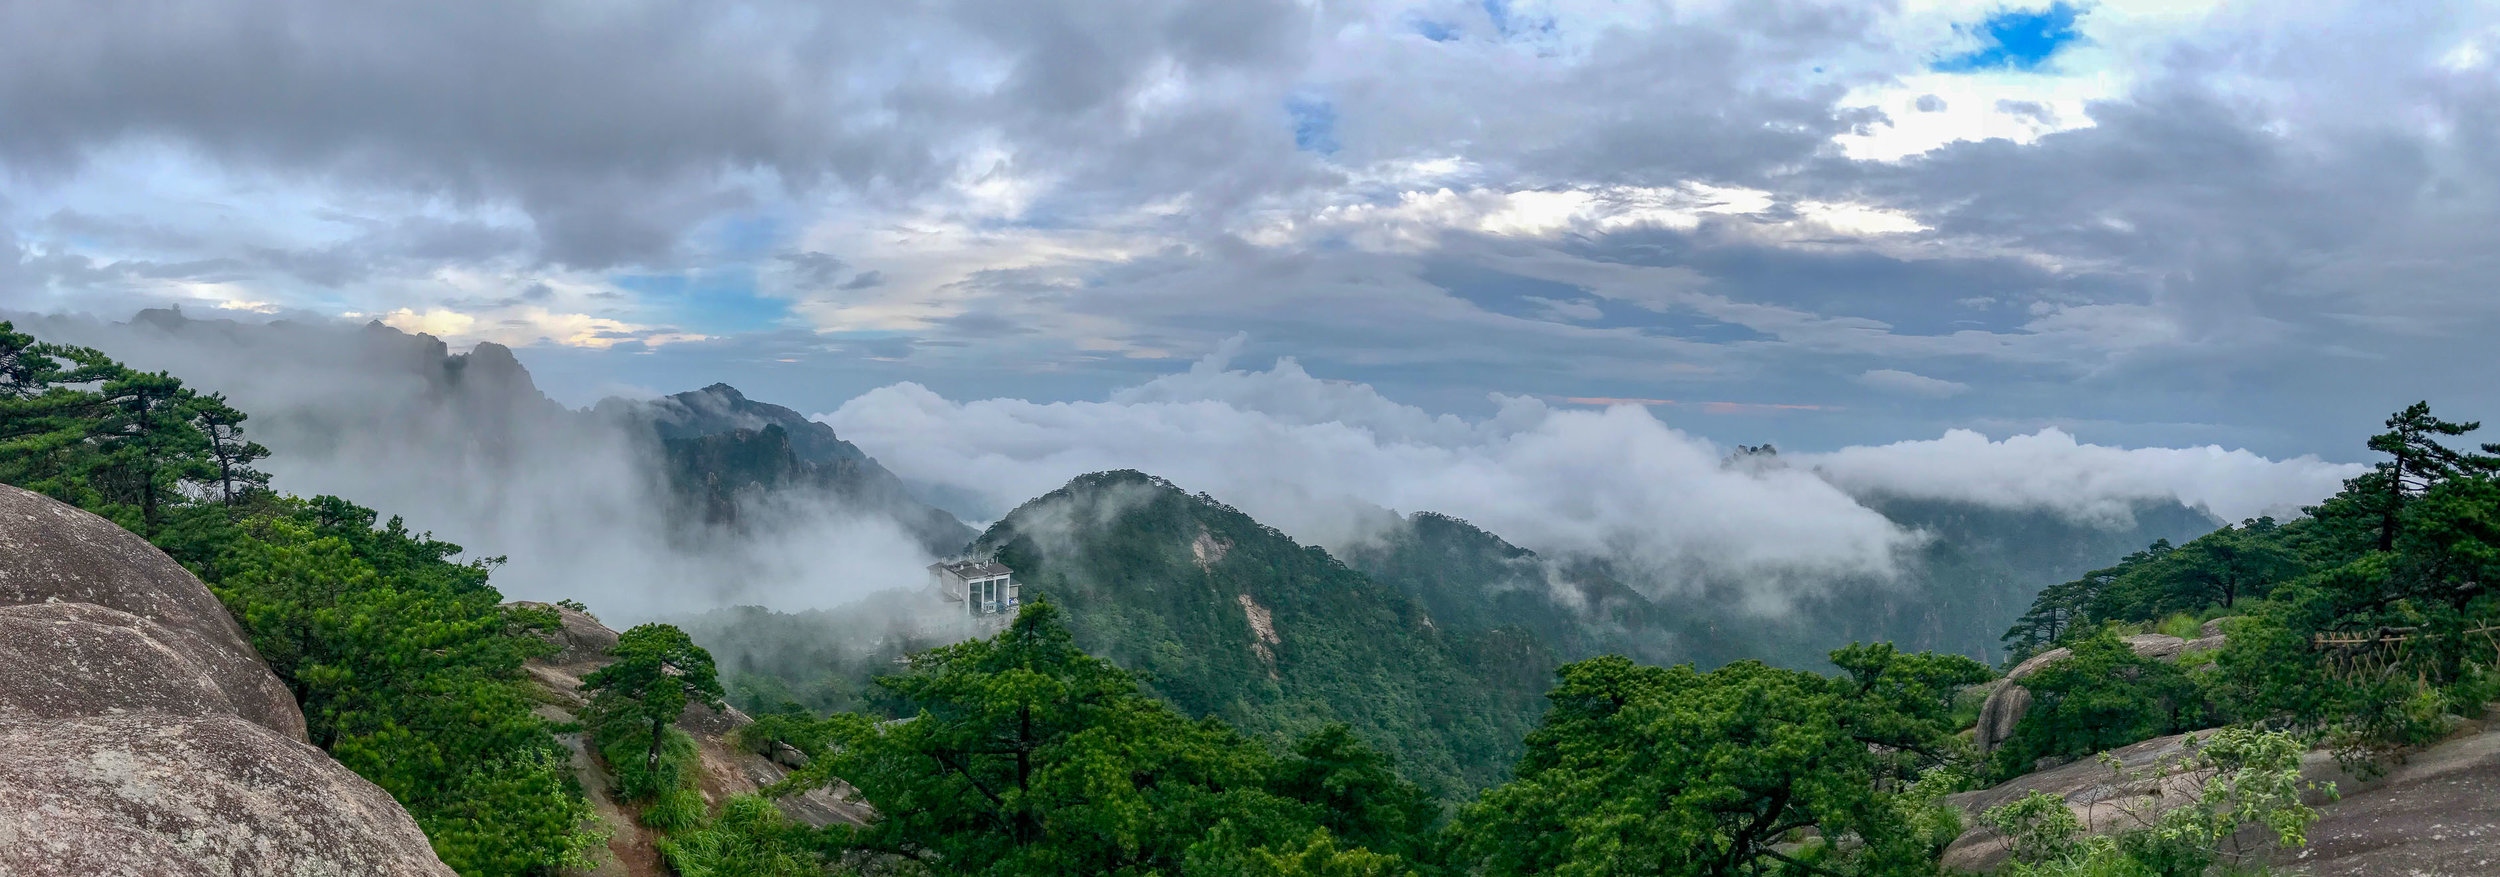 huangshan-12.jpg